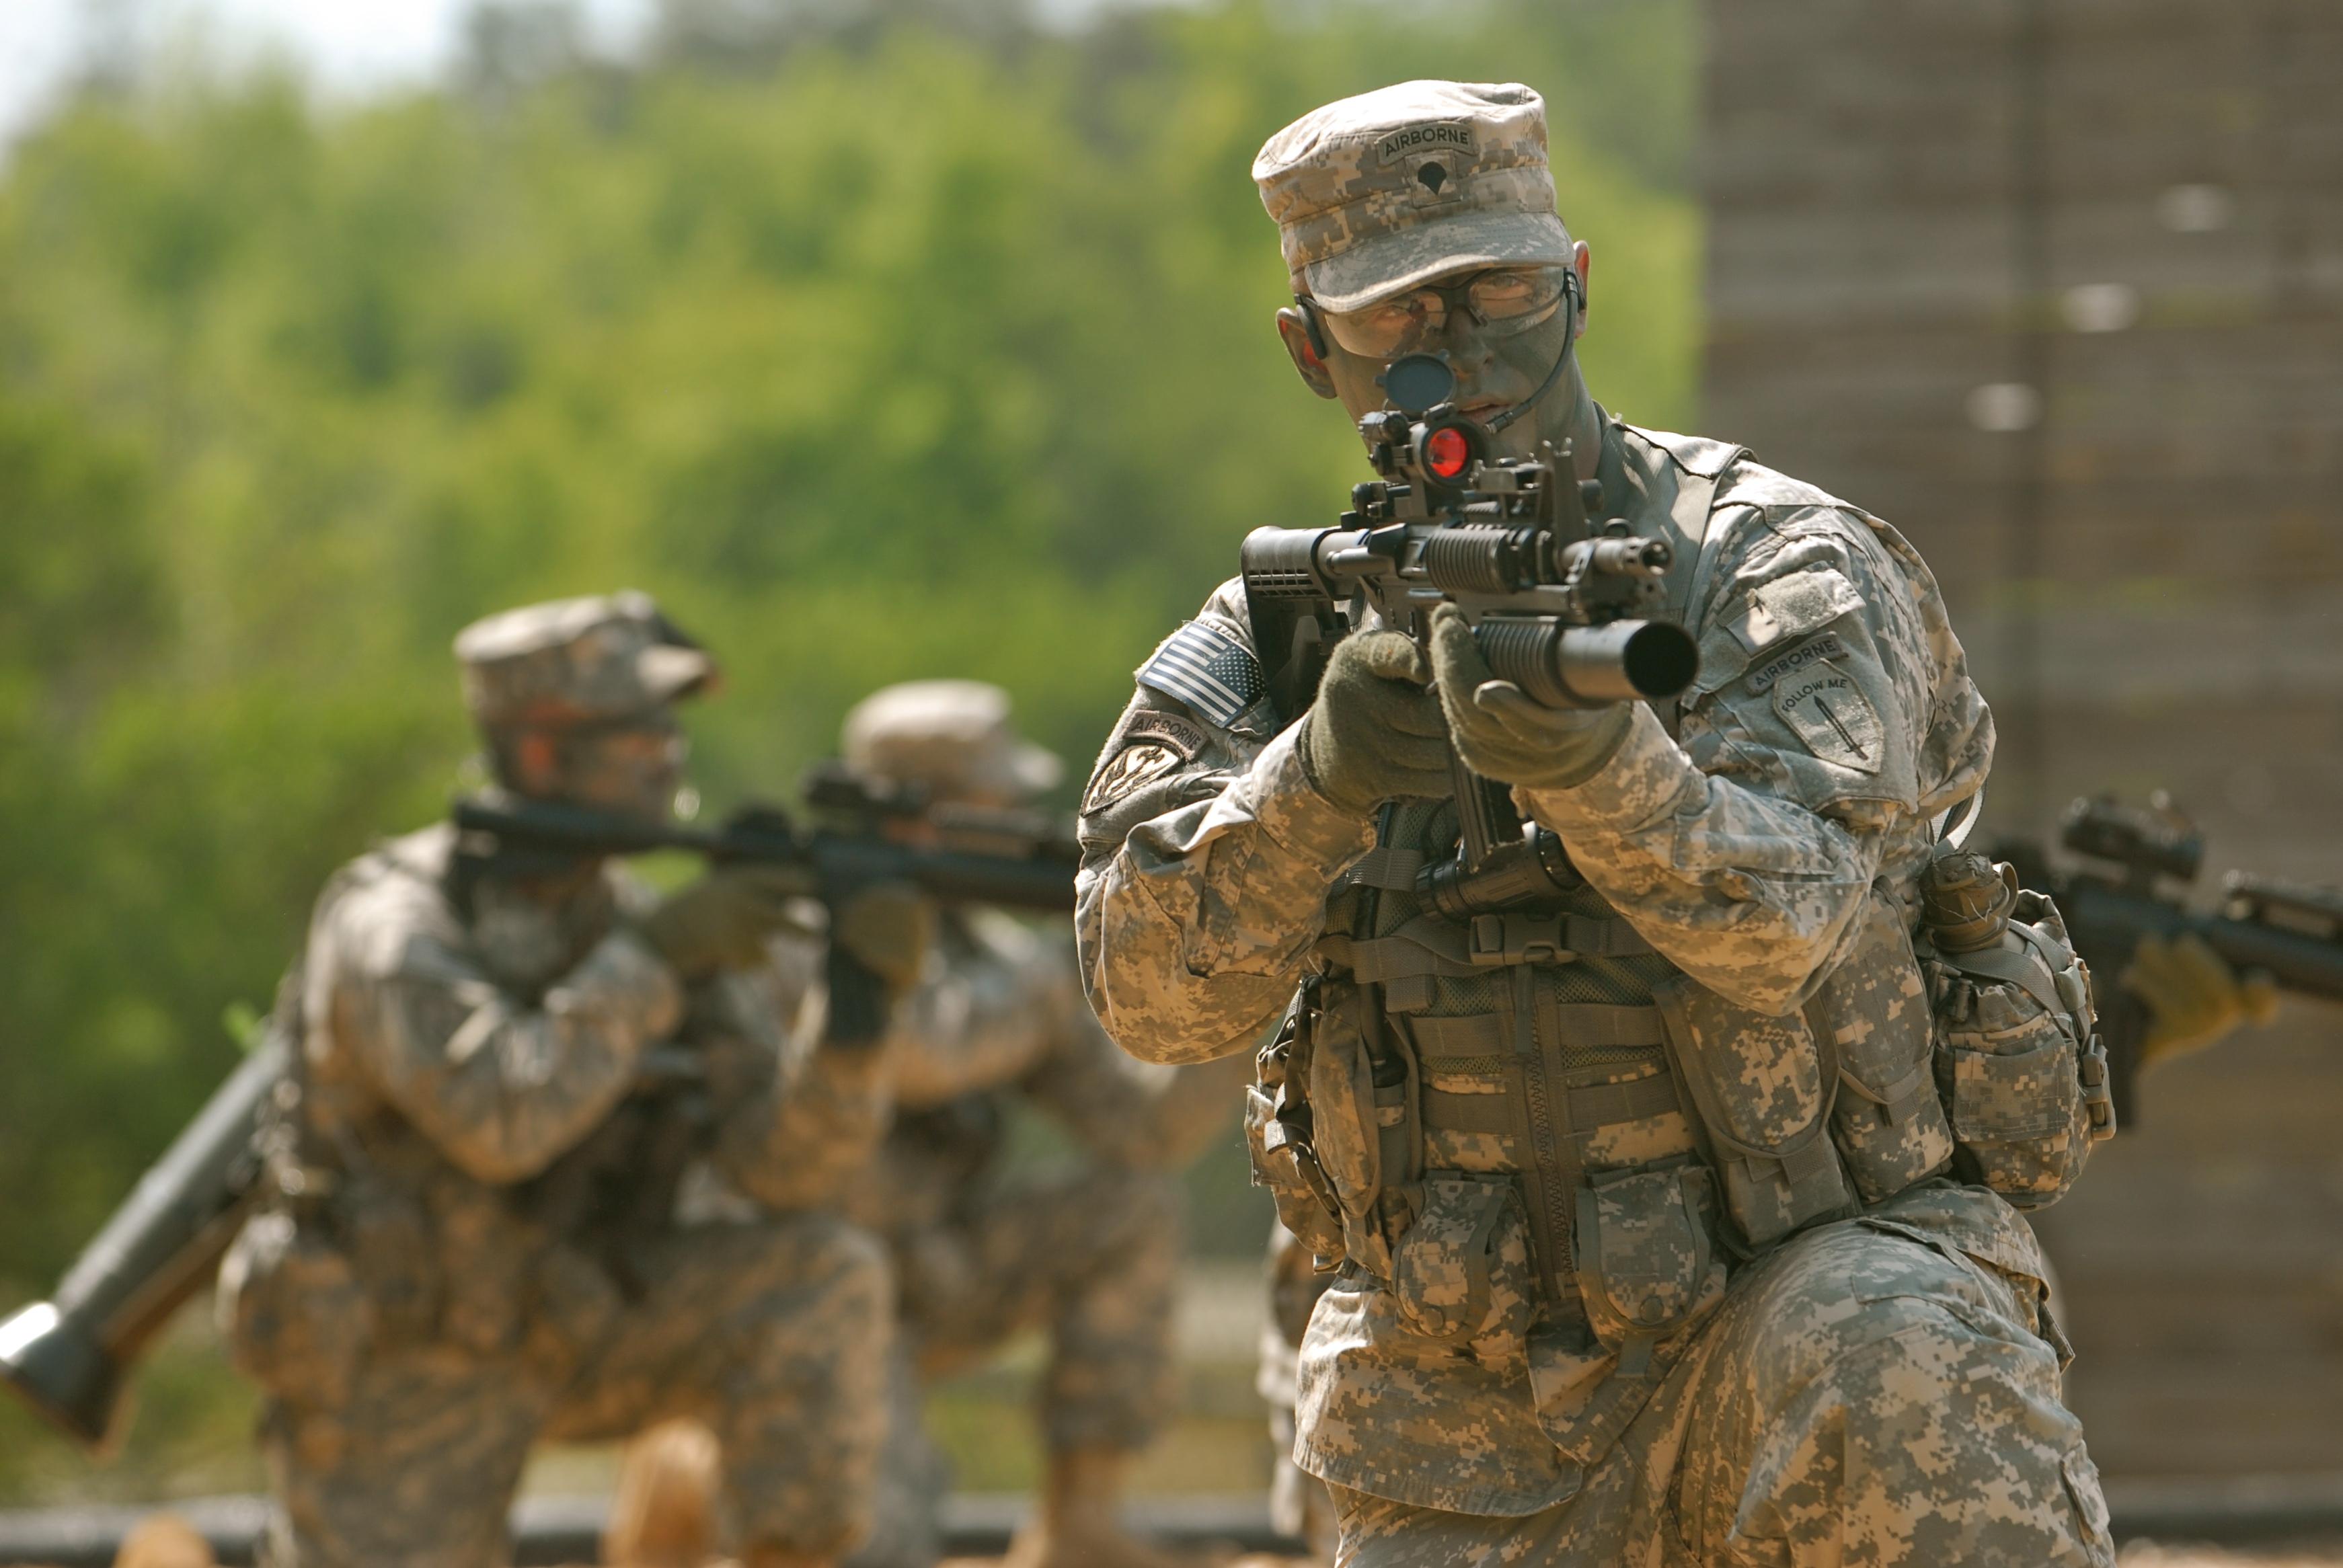 Army Rangers Term Paper Academic Service Enessayvjskteleteriaus